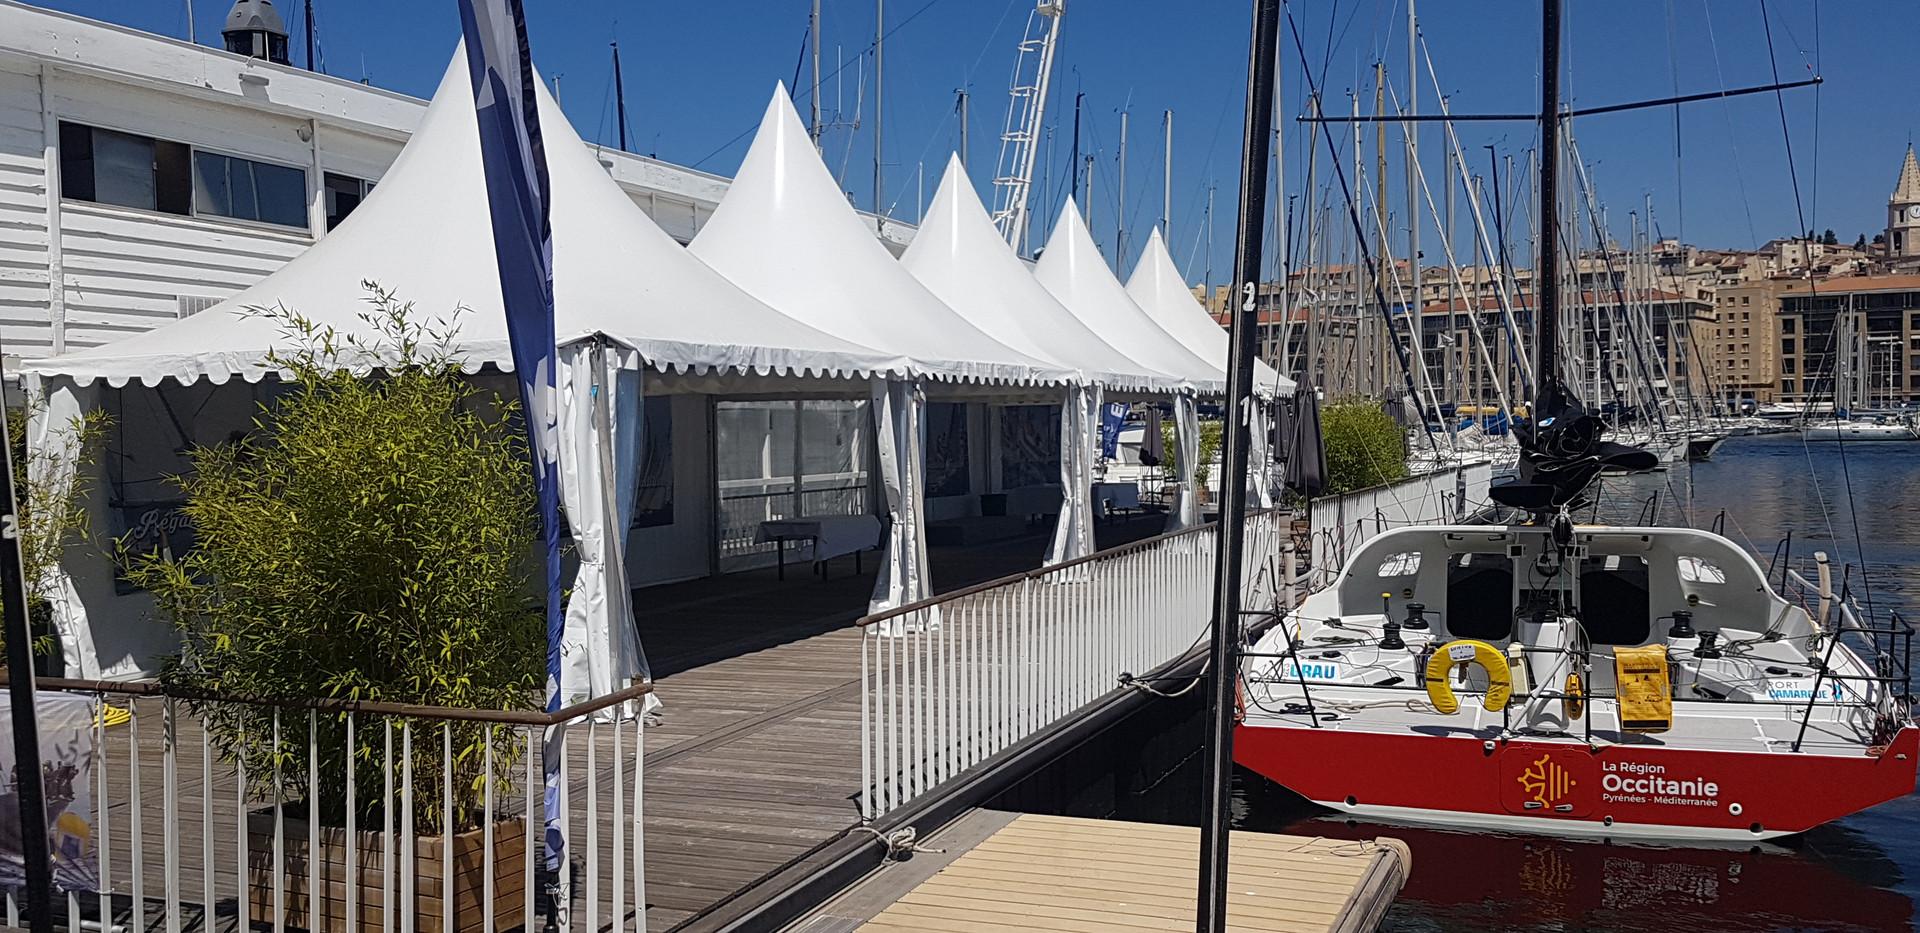 Tentes pagodes Marseille